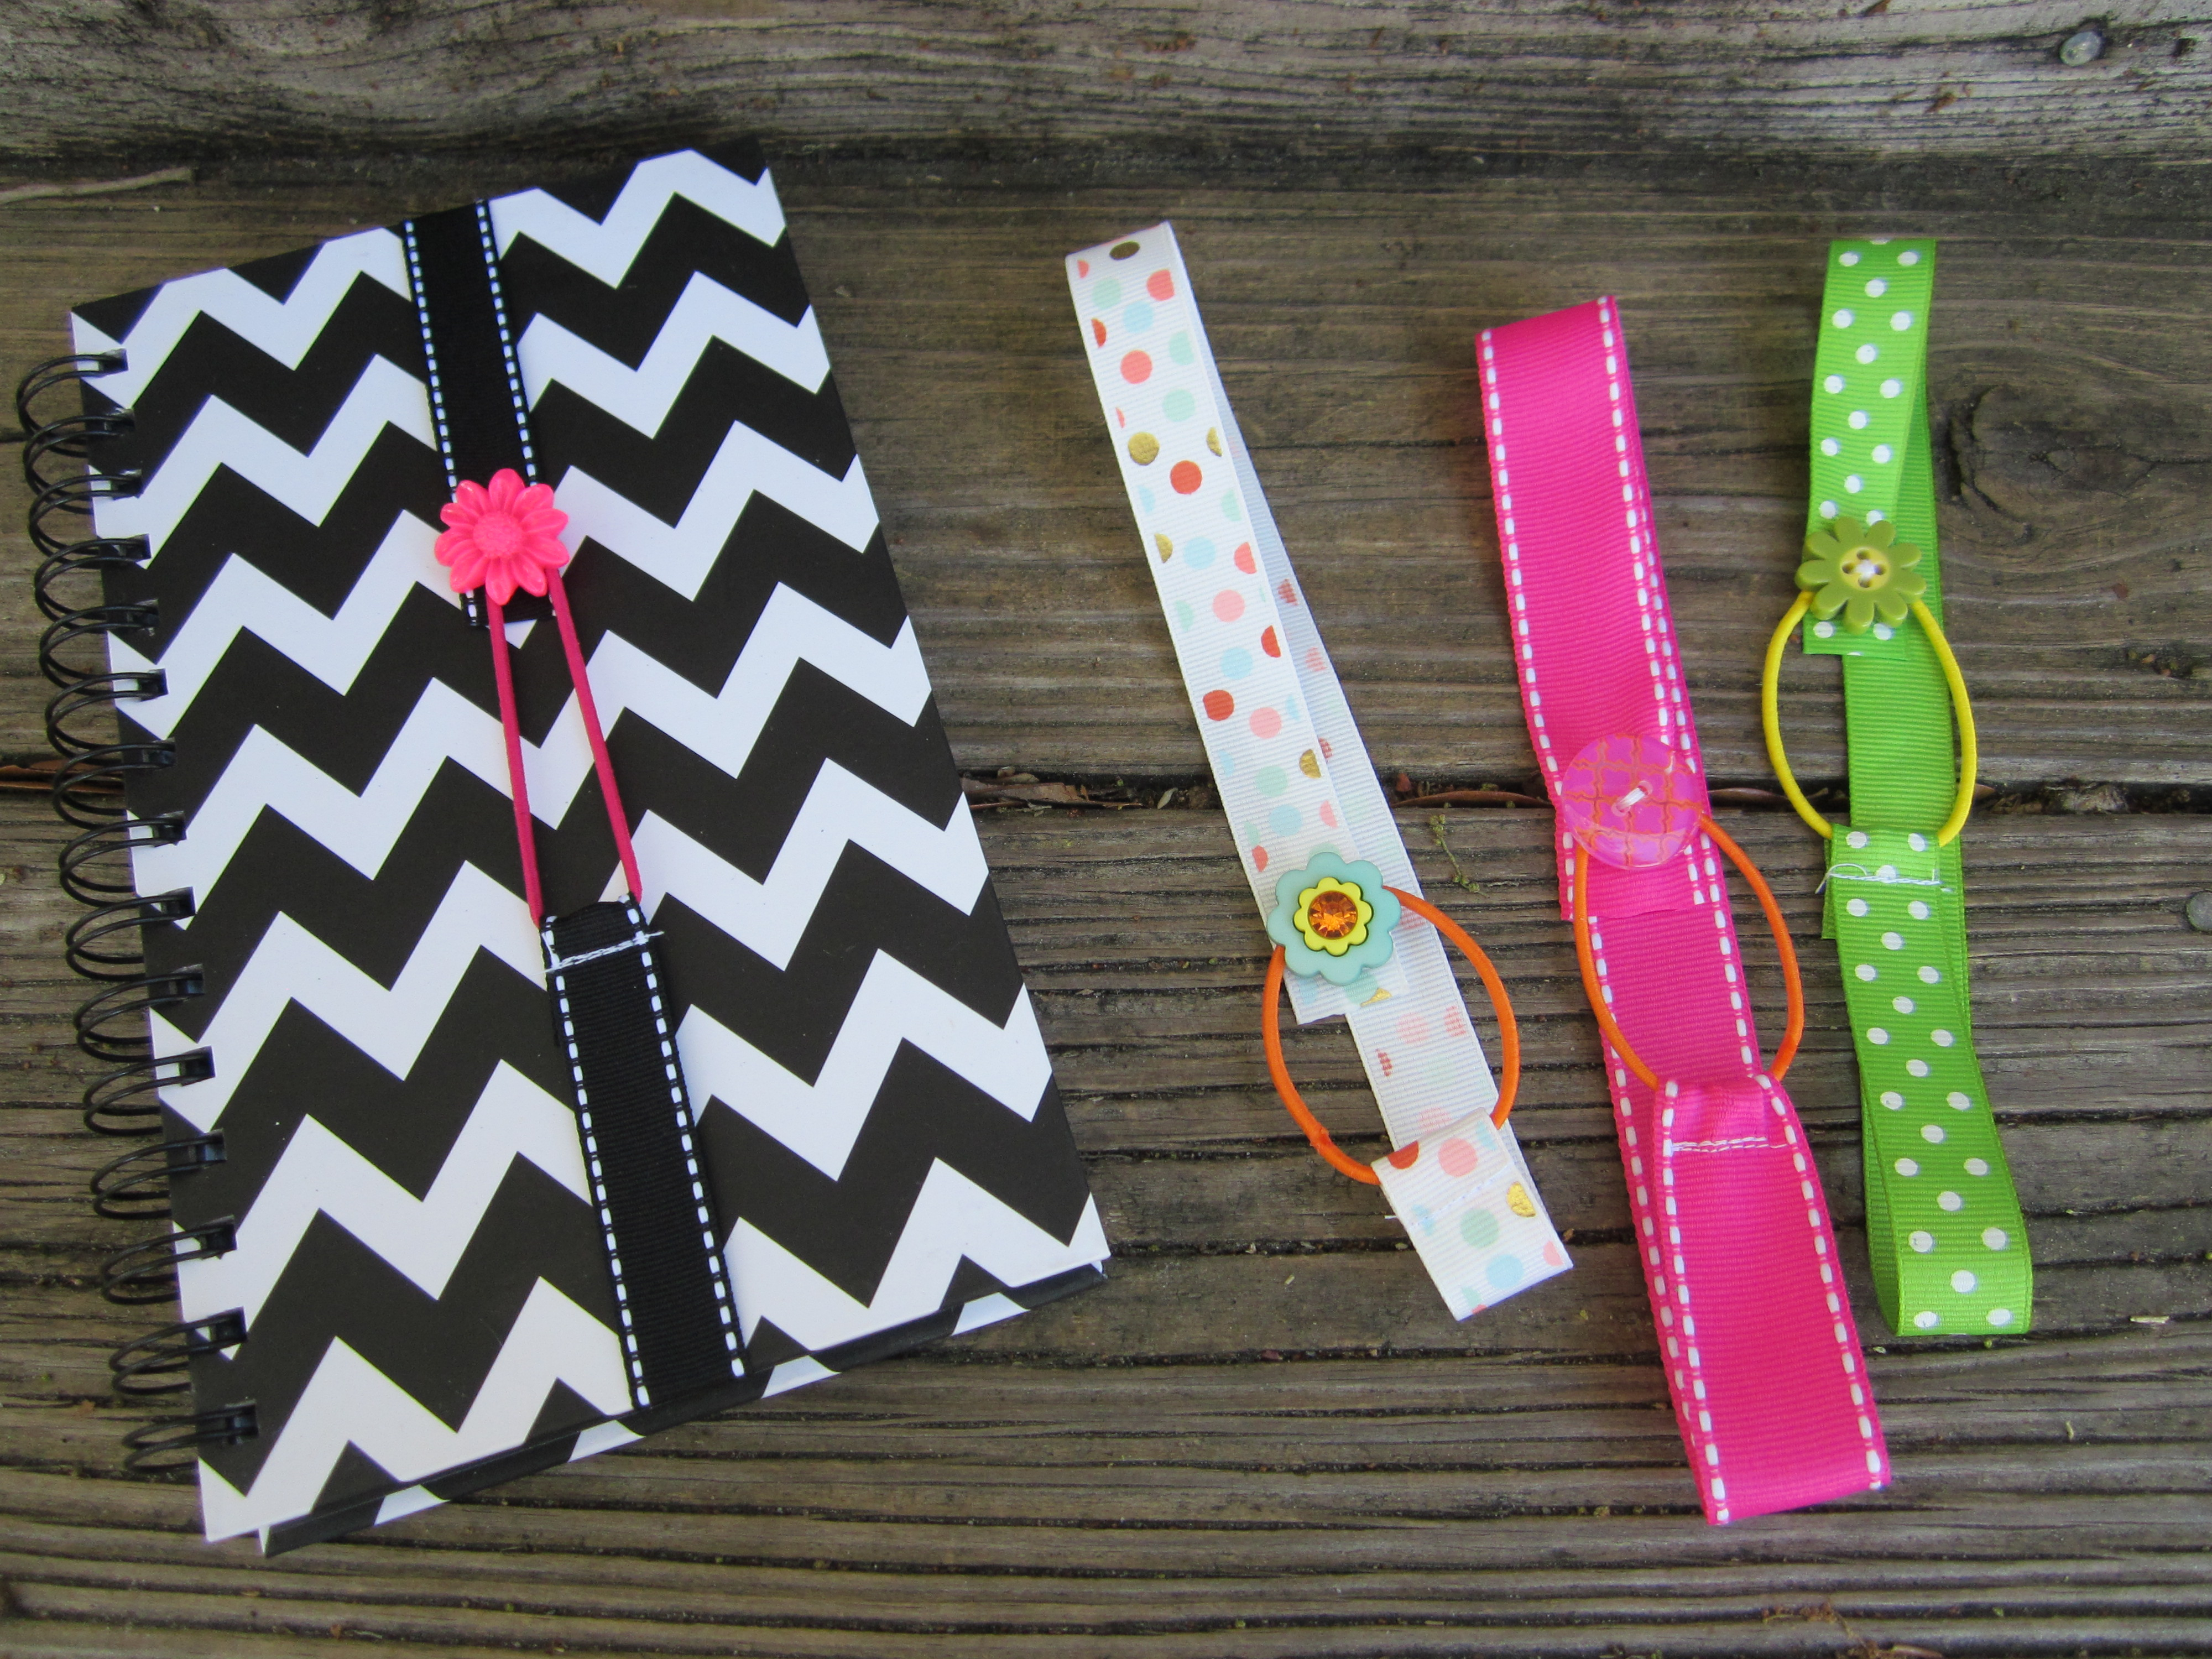 Scrapbook ideas using ribbon - Ribbon Bookmark Group